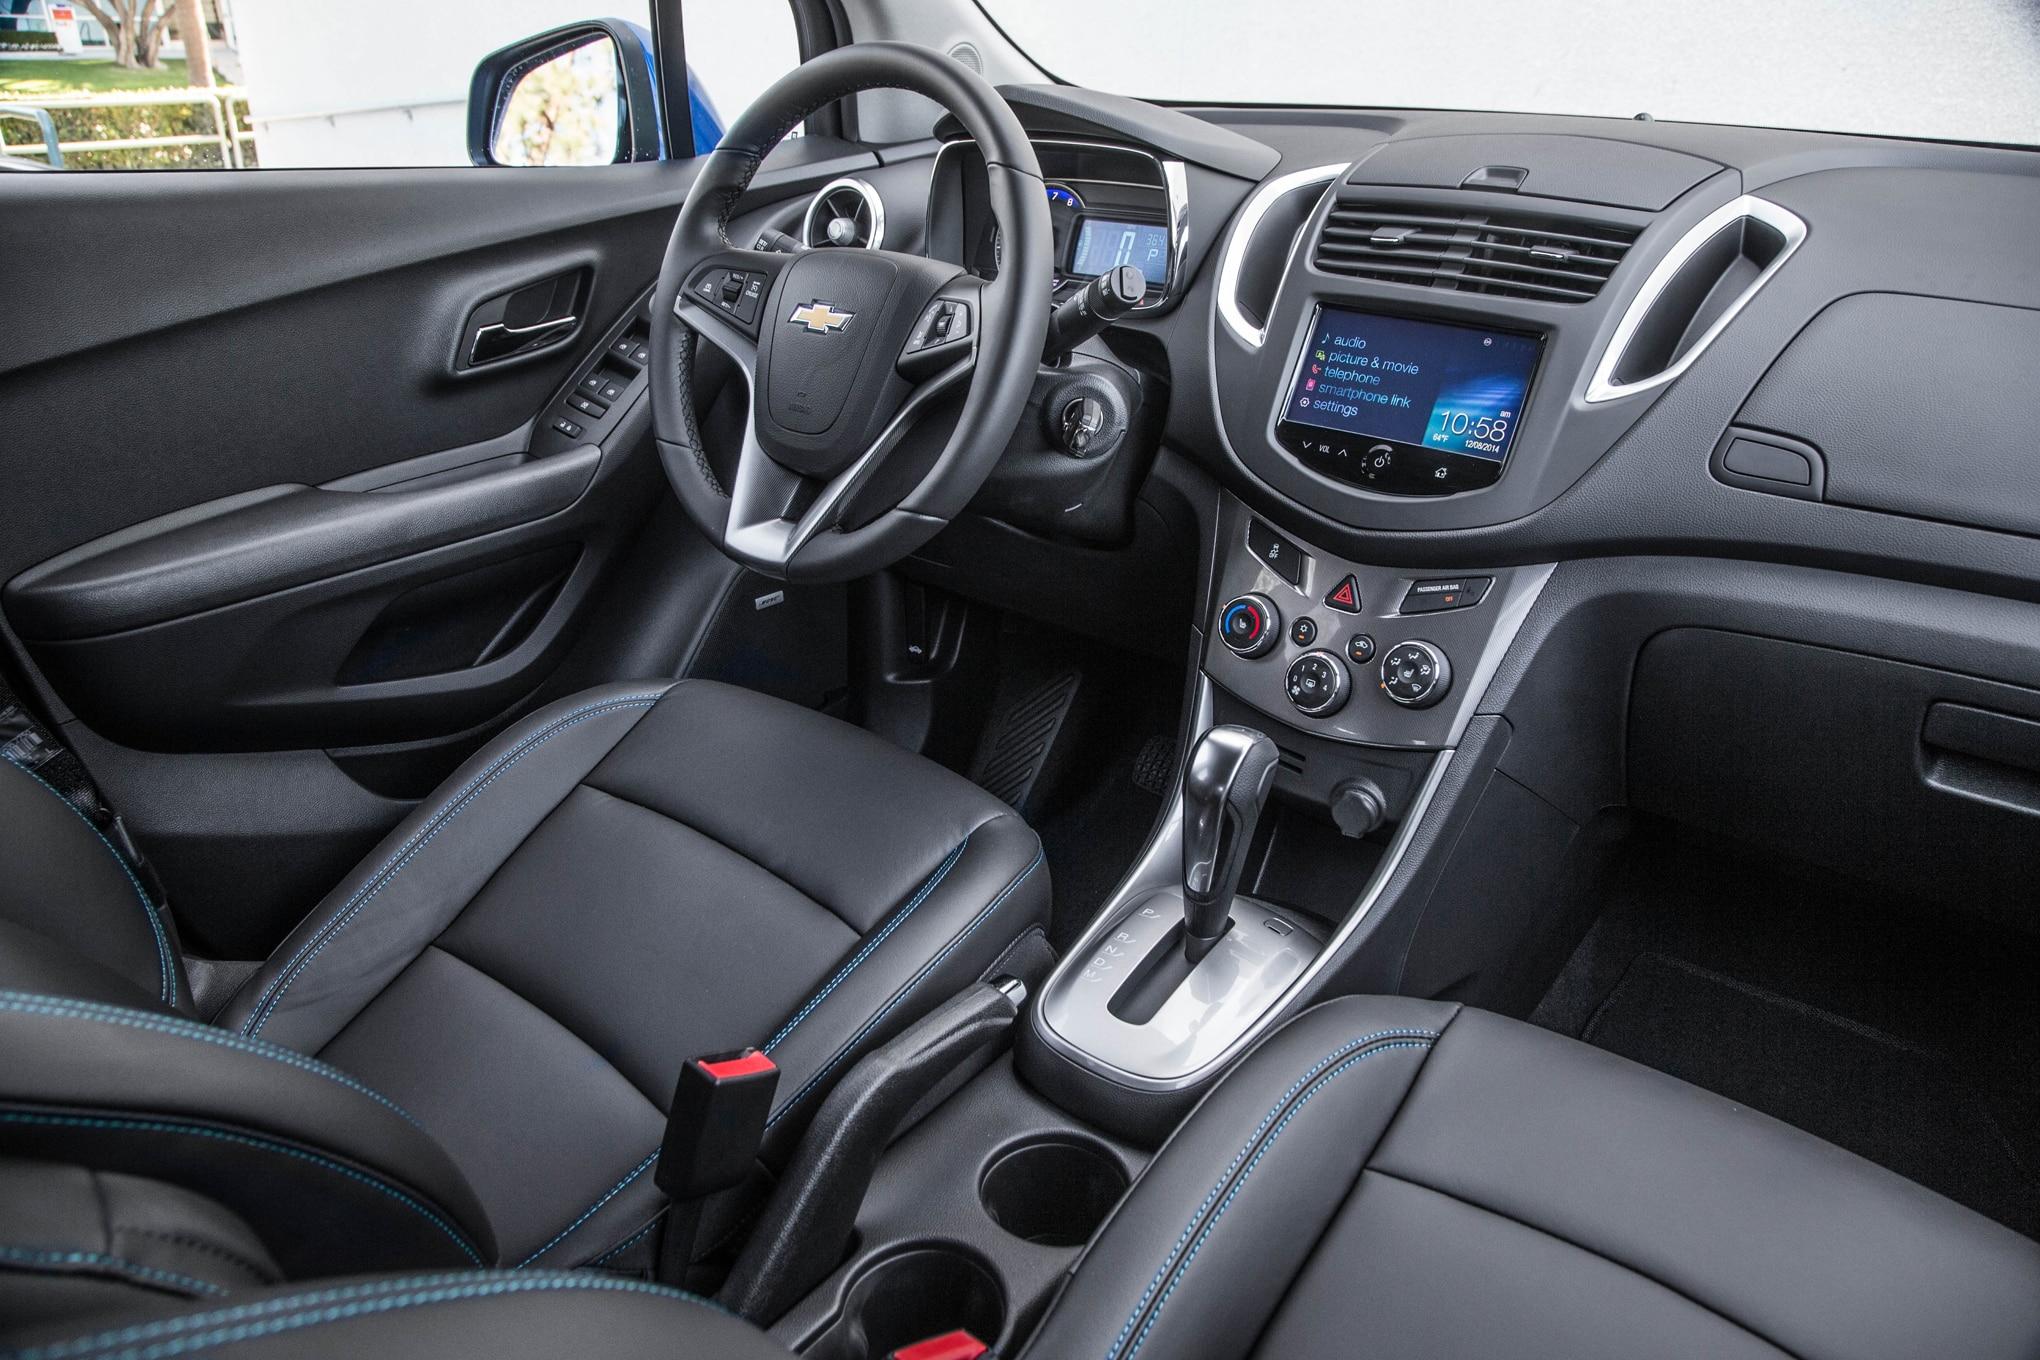 2015 Chevrolet Trax Ltz First Test Motor Trend